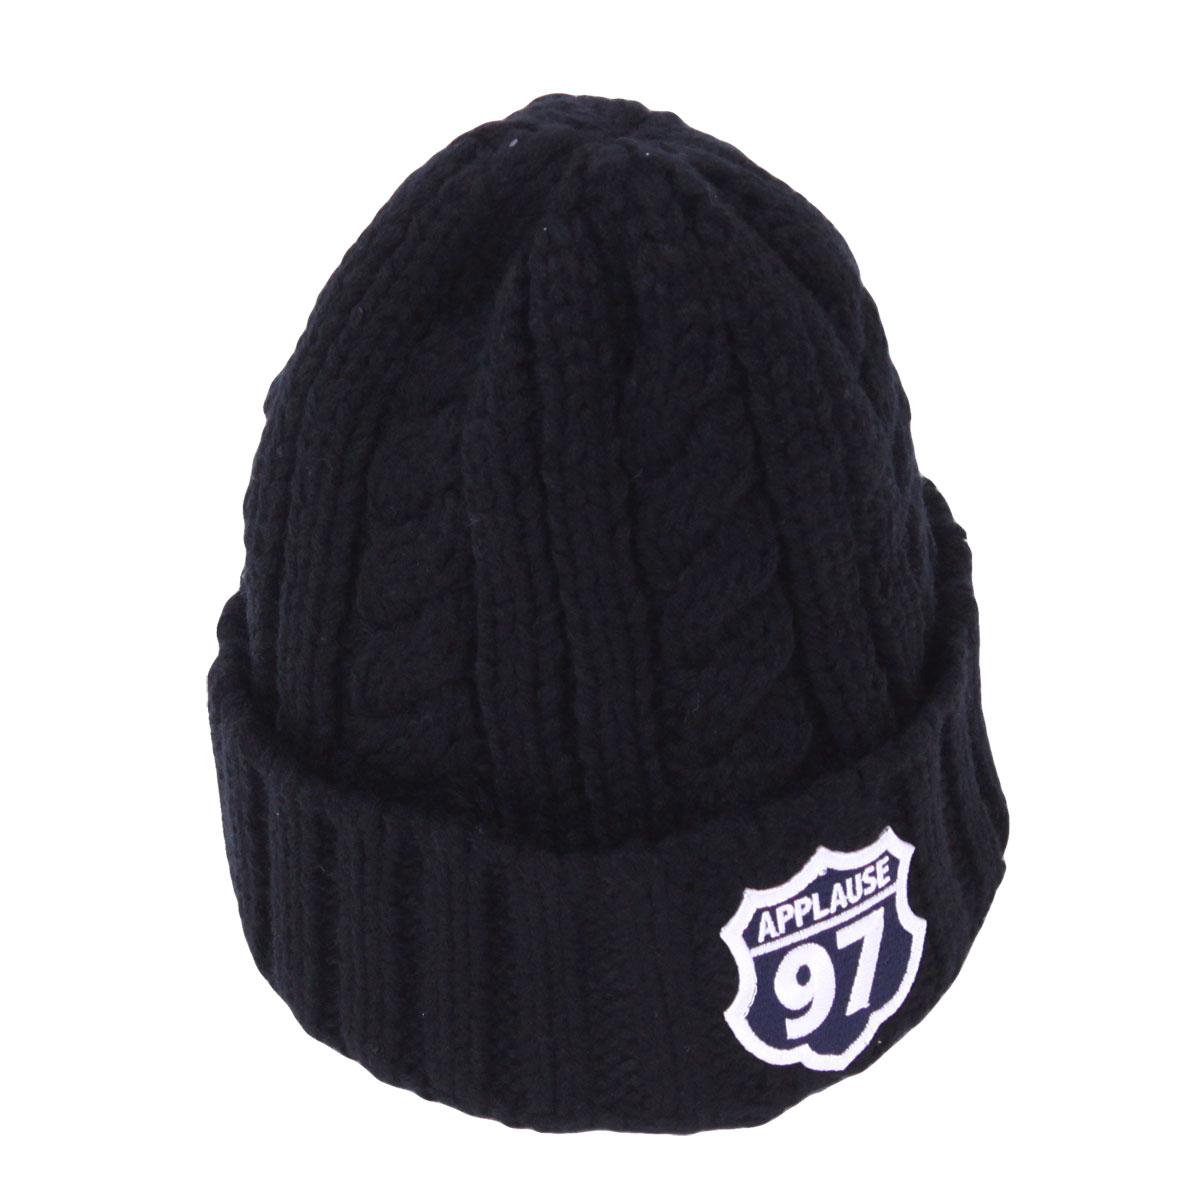 AP97 CABLE Beanie Cap (Black)